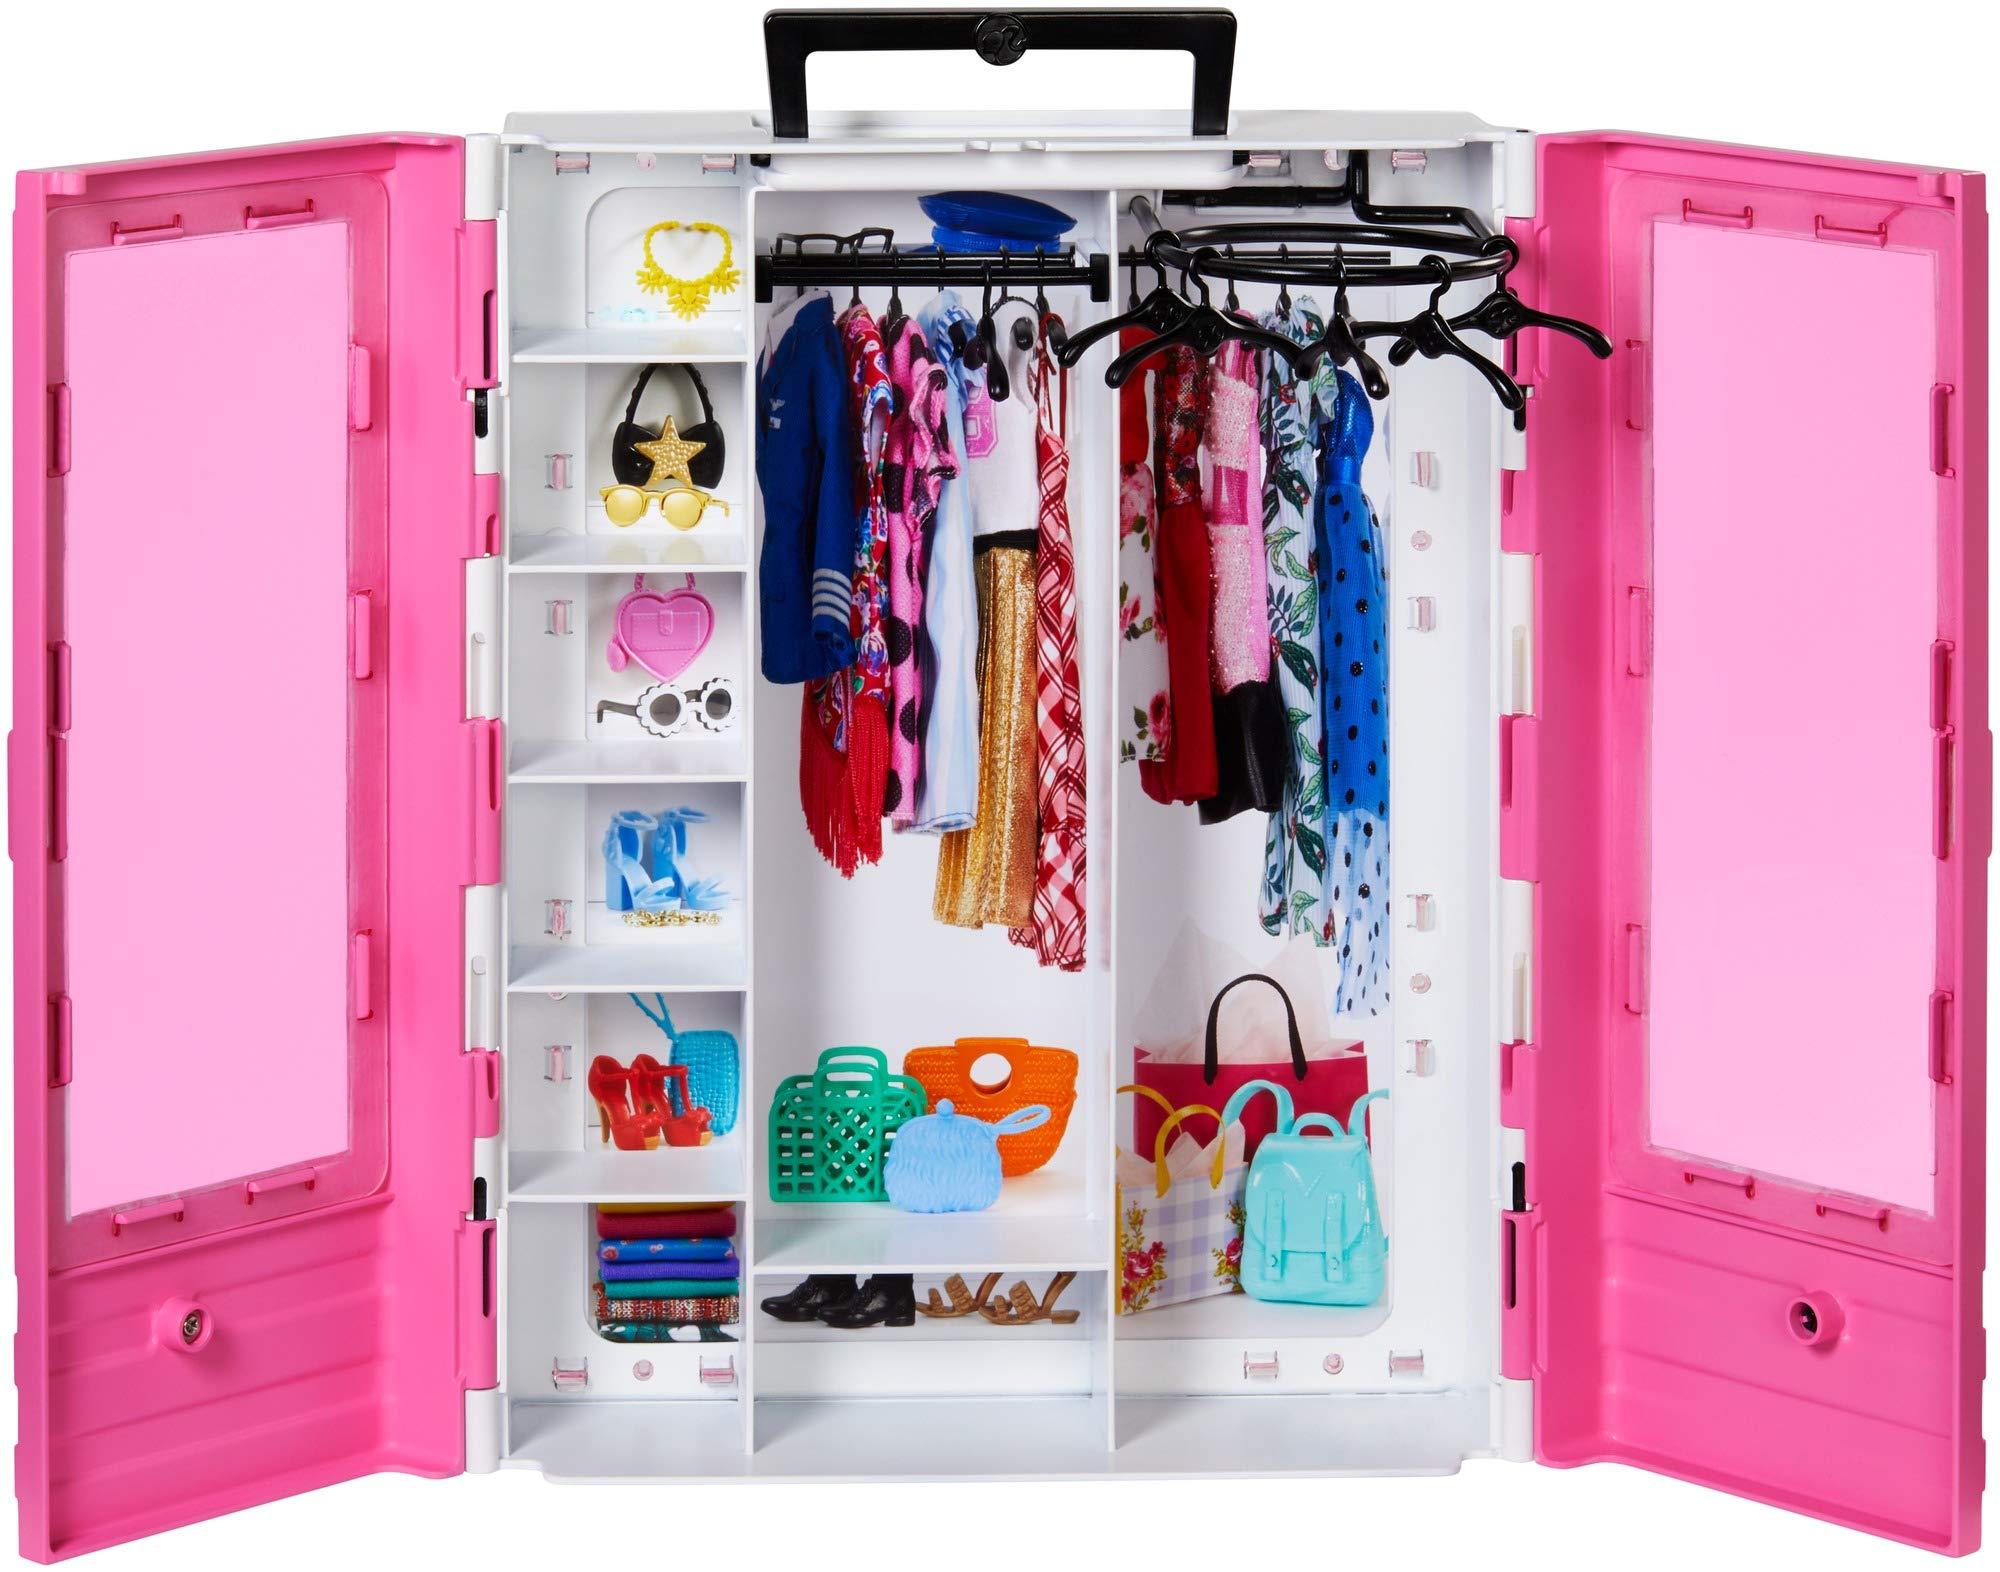 Barbie Fashionistas Ultimate Closet Accessory by Barbie